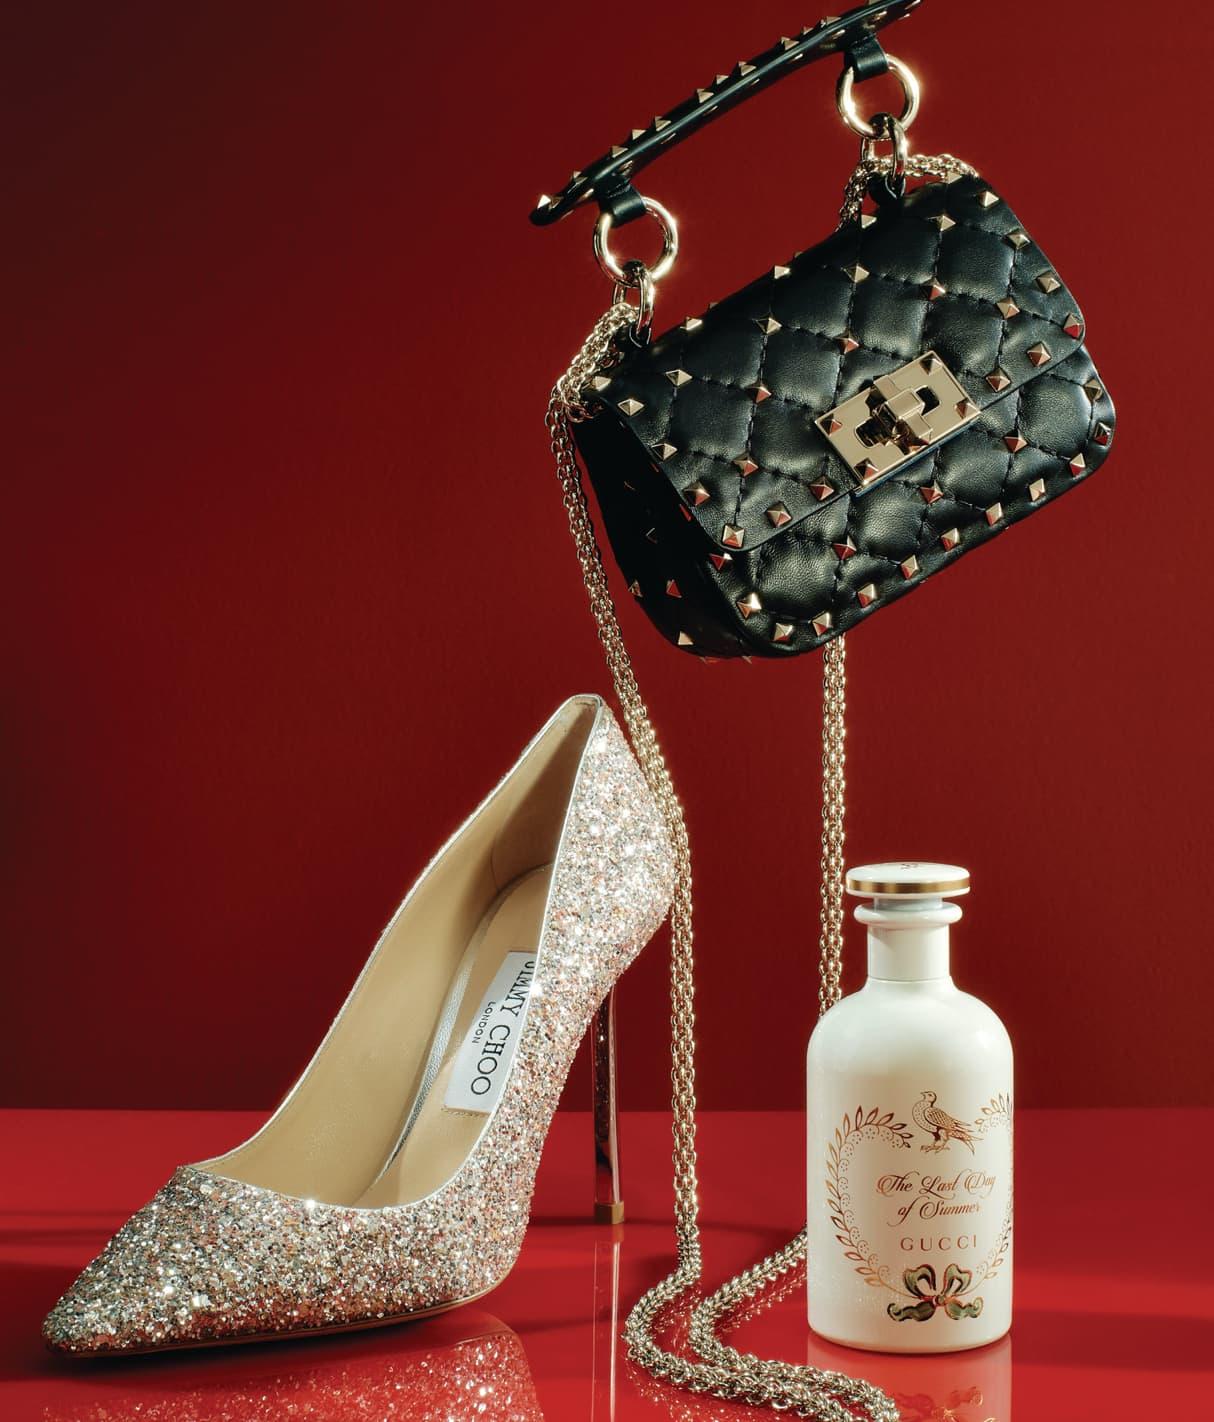 David Jones Online Shop Fashion Beauty Home More